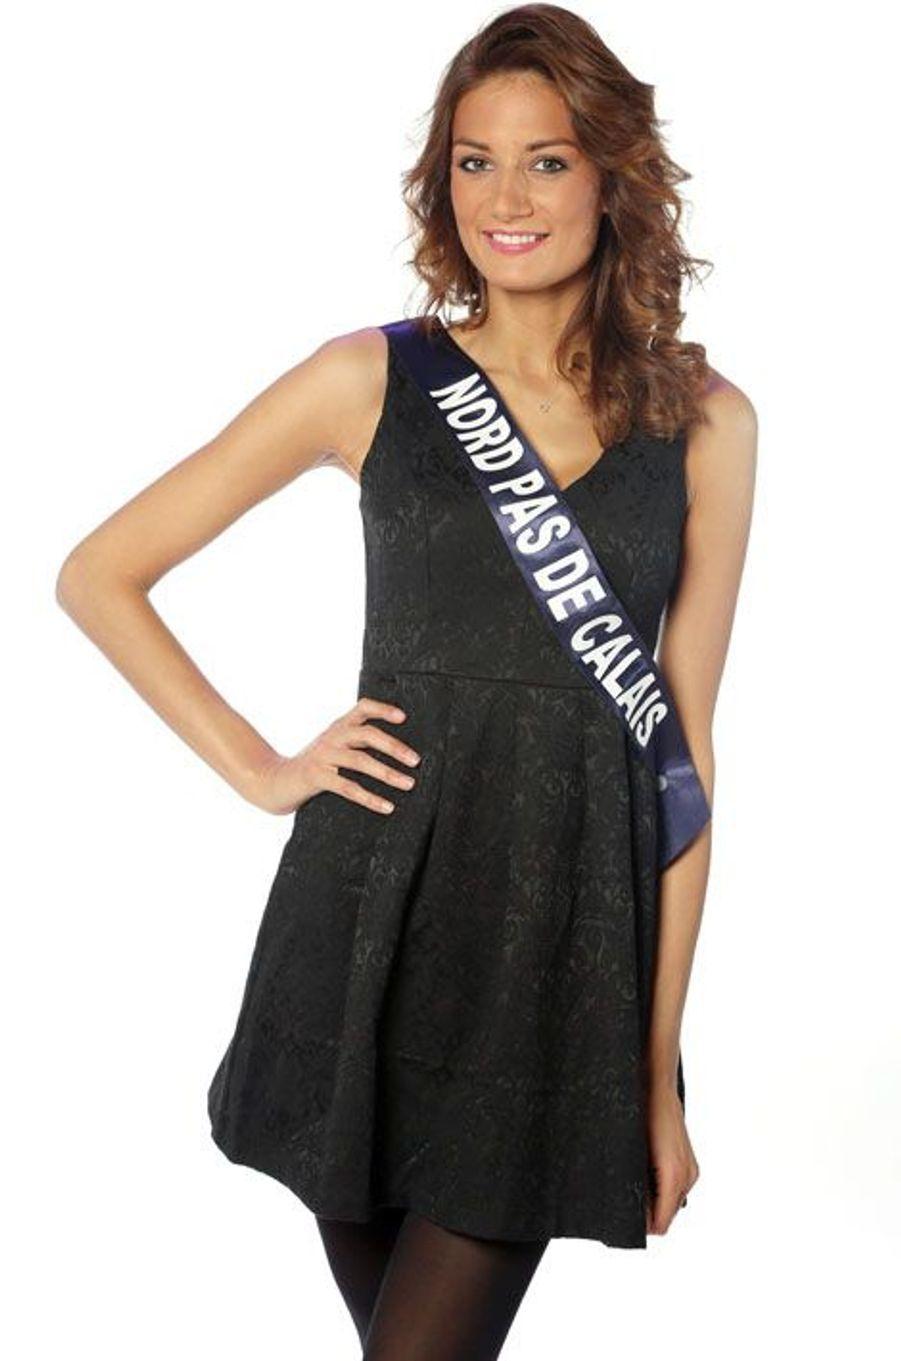 Gaëlle Mans, 23 ans, Miss Nord Pas de Calais